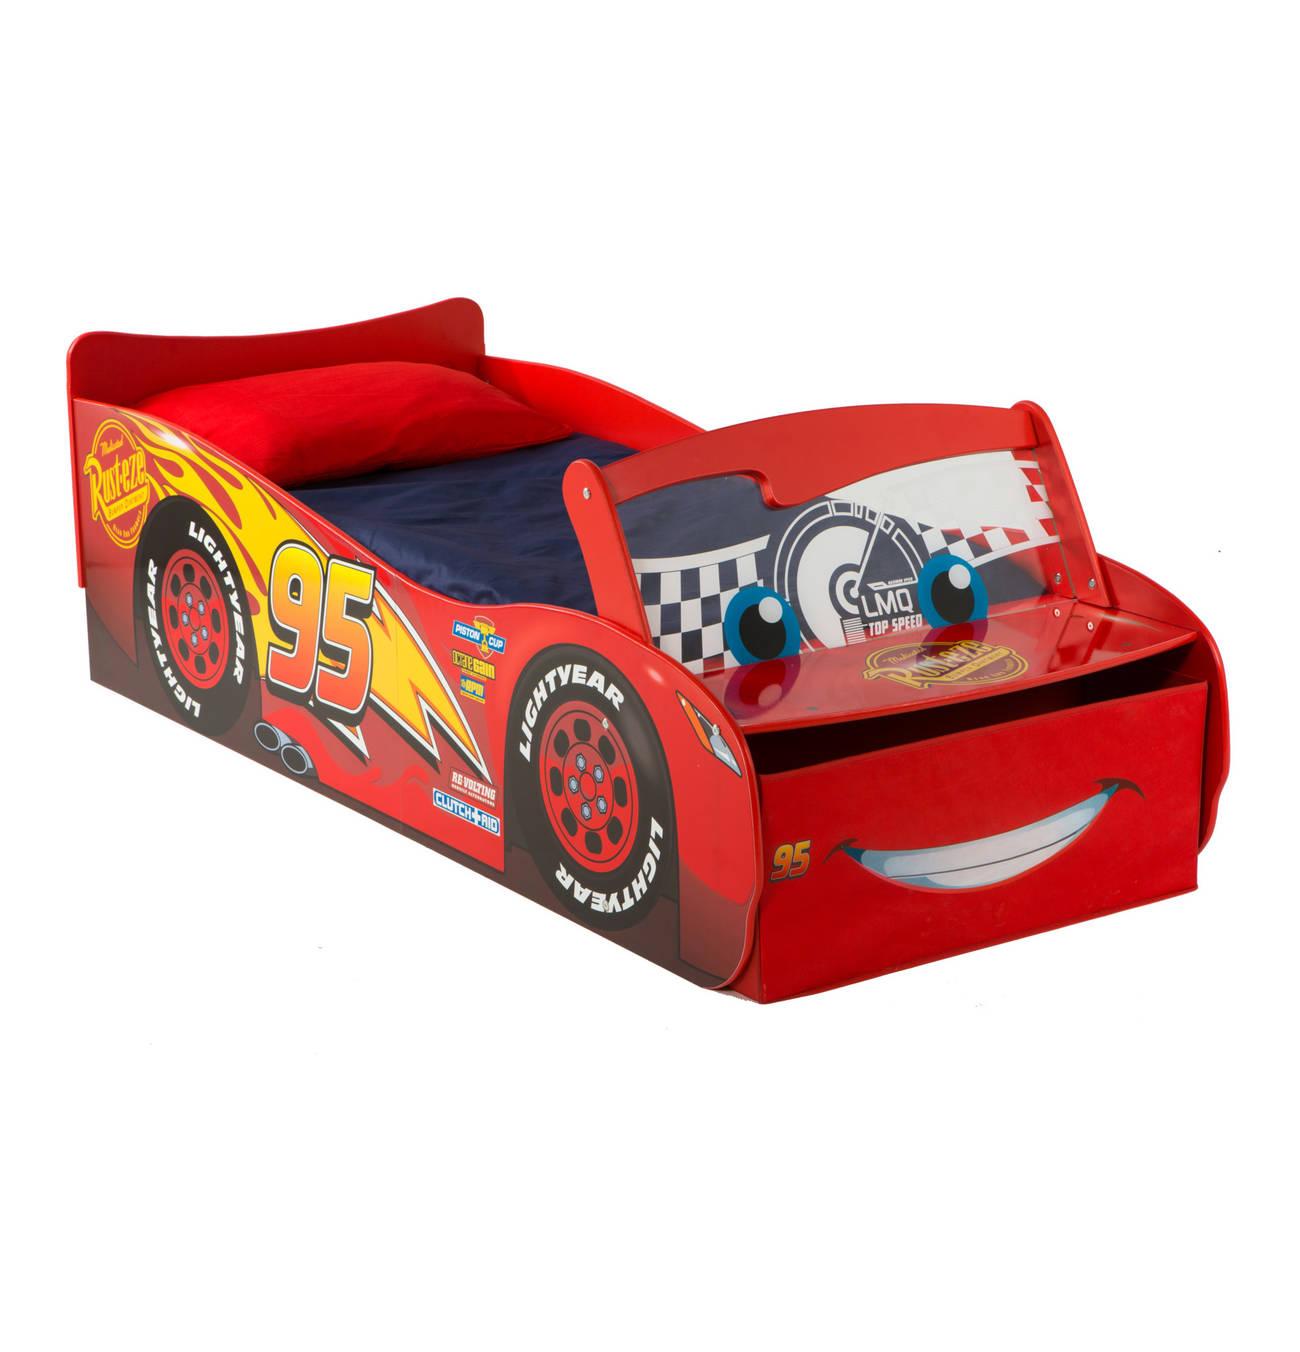 Worlds Apart Kinderbett De Luxe Cars 3 Mdf Kinderbett Betten